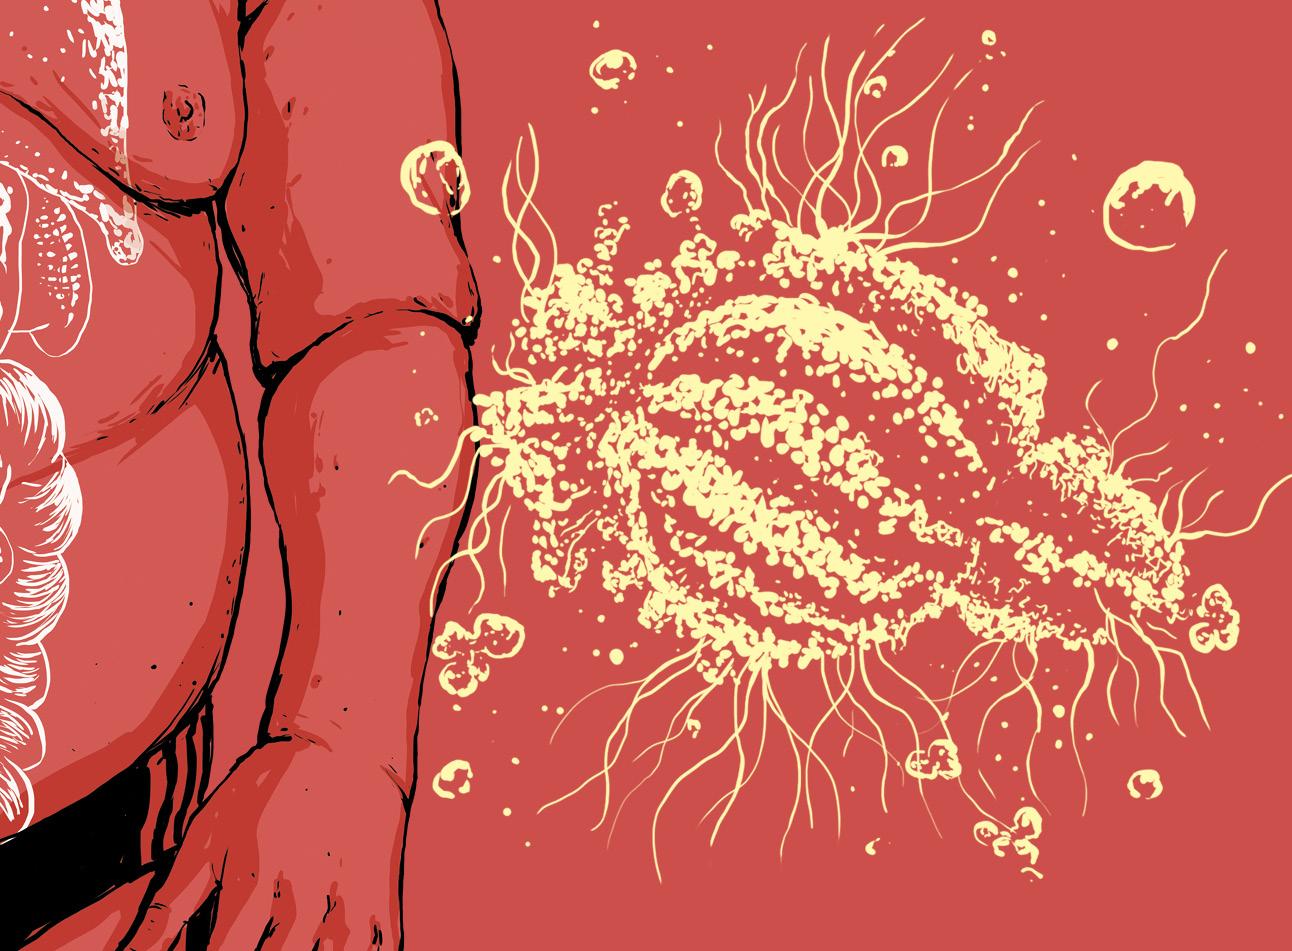 7 - sistema imunológico fraco